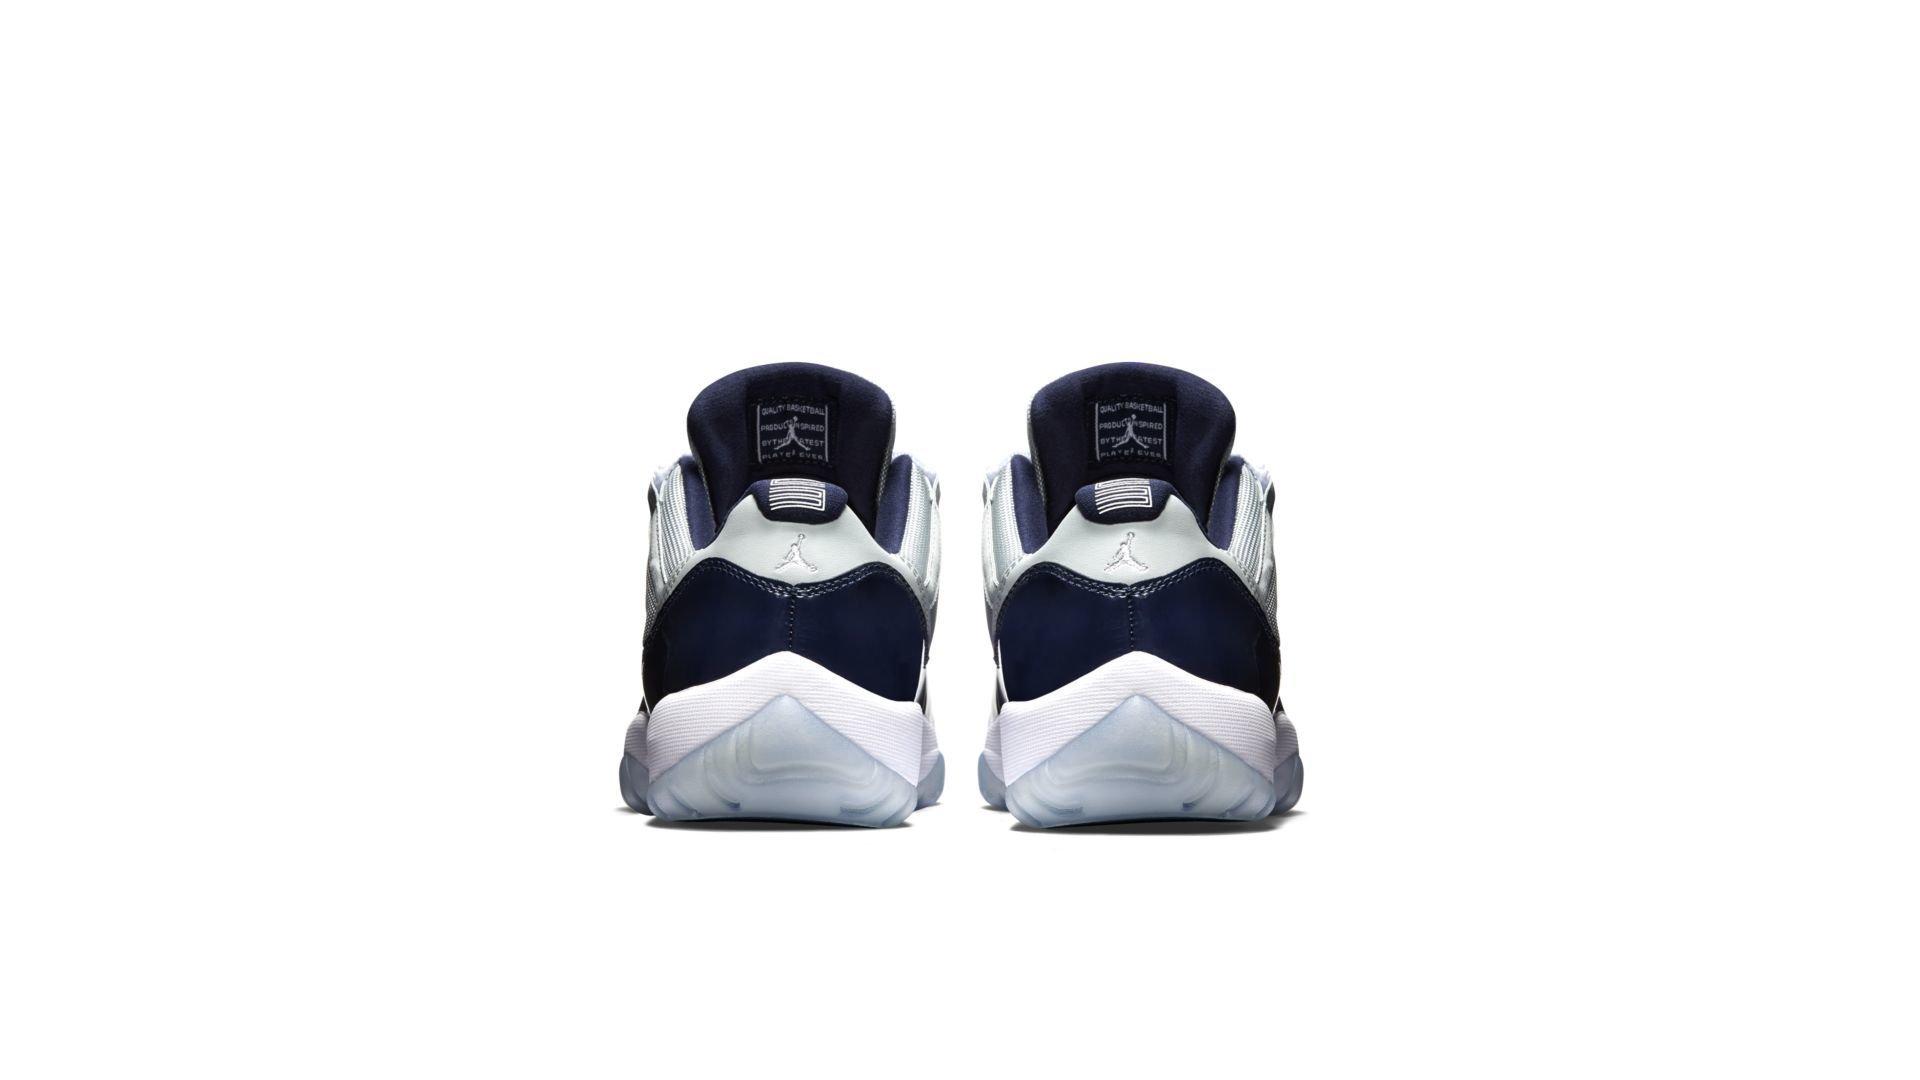 Jordan 11 Retro Low Georgetown (528895-007)